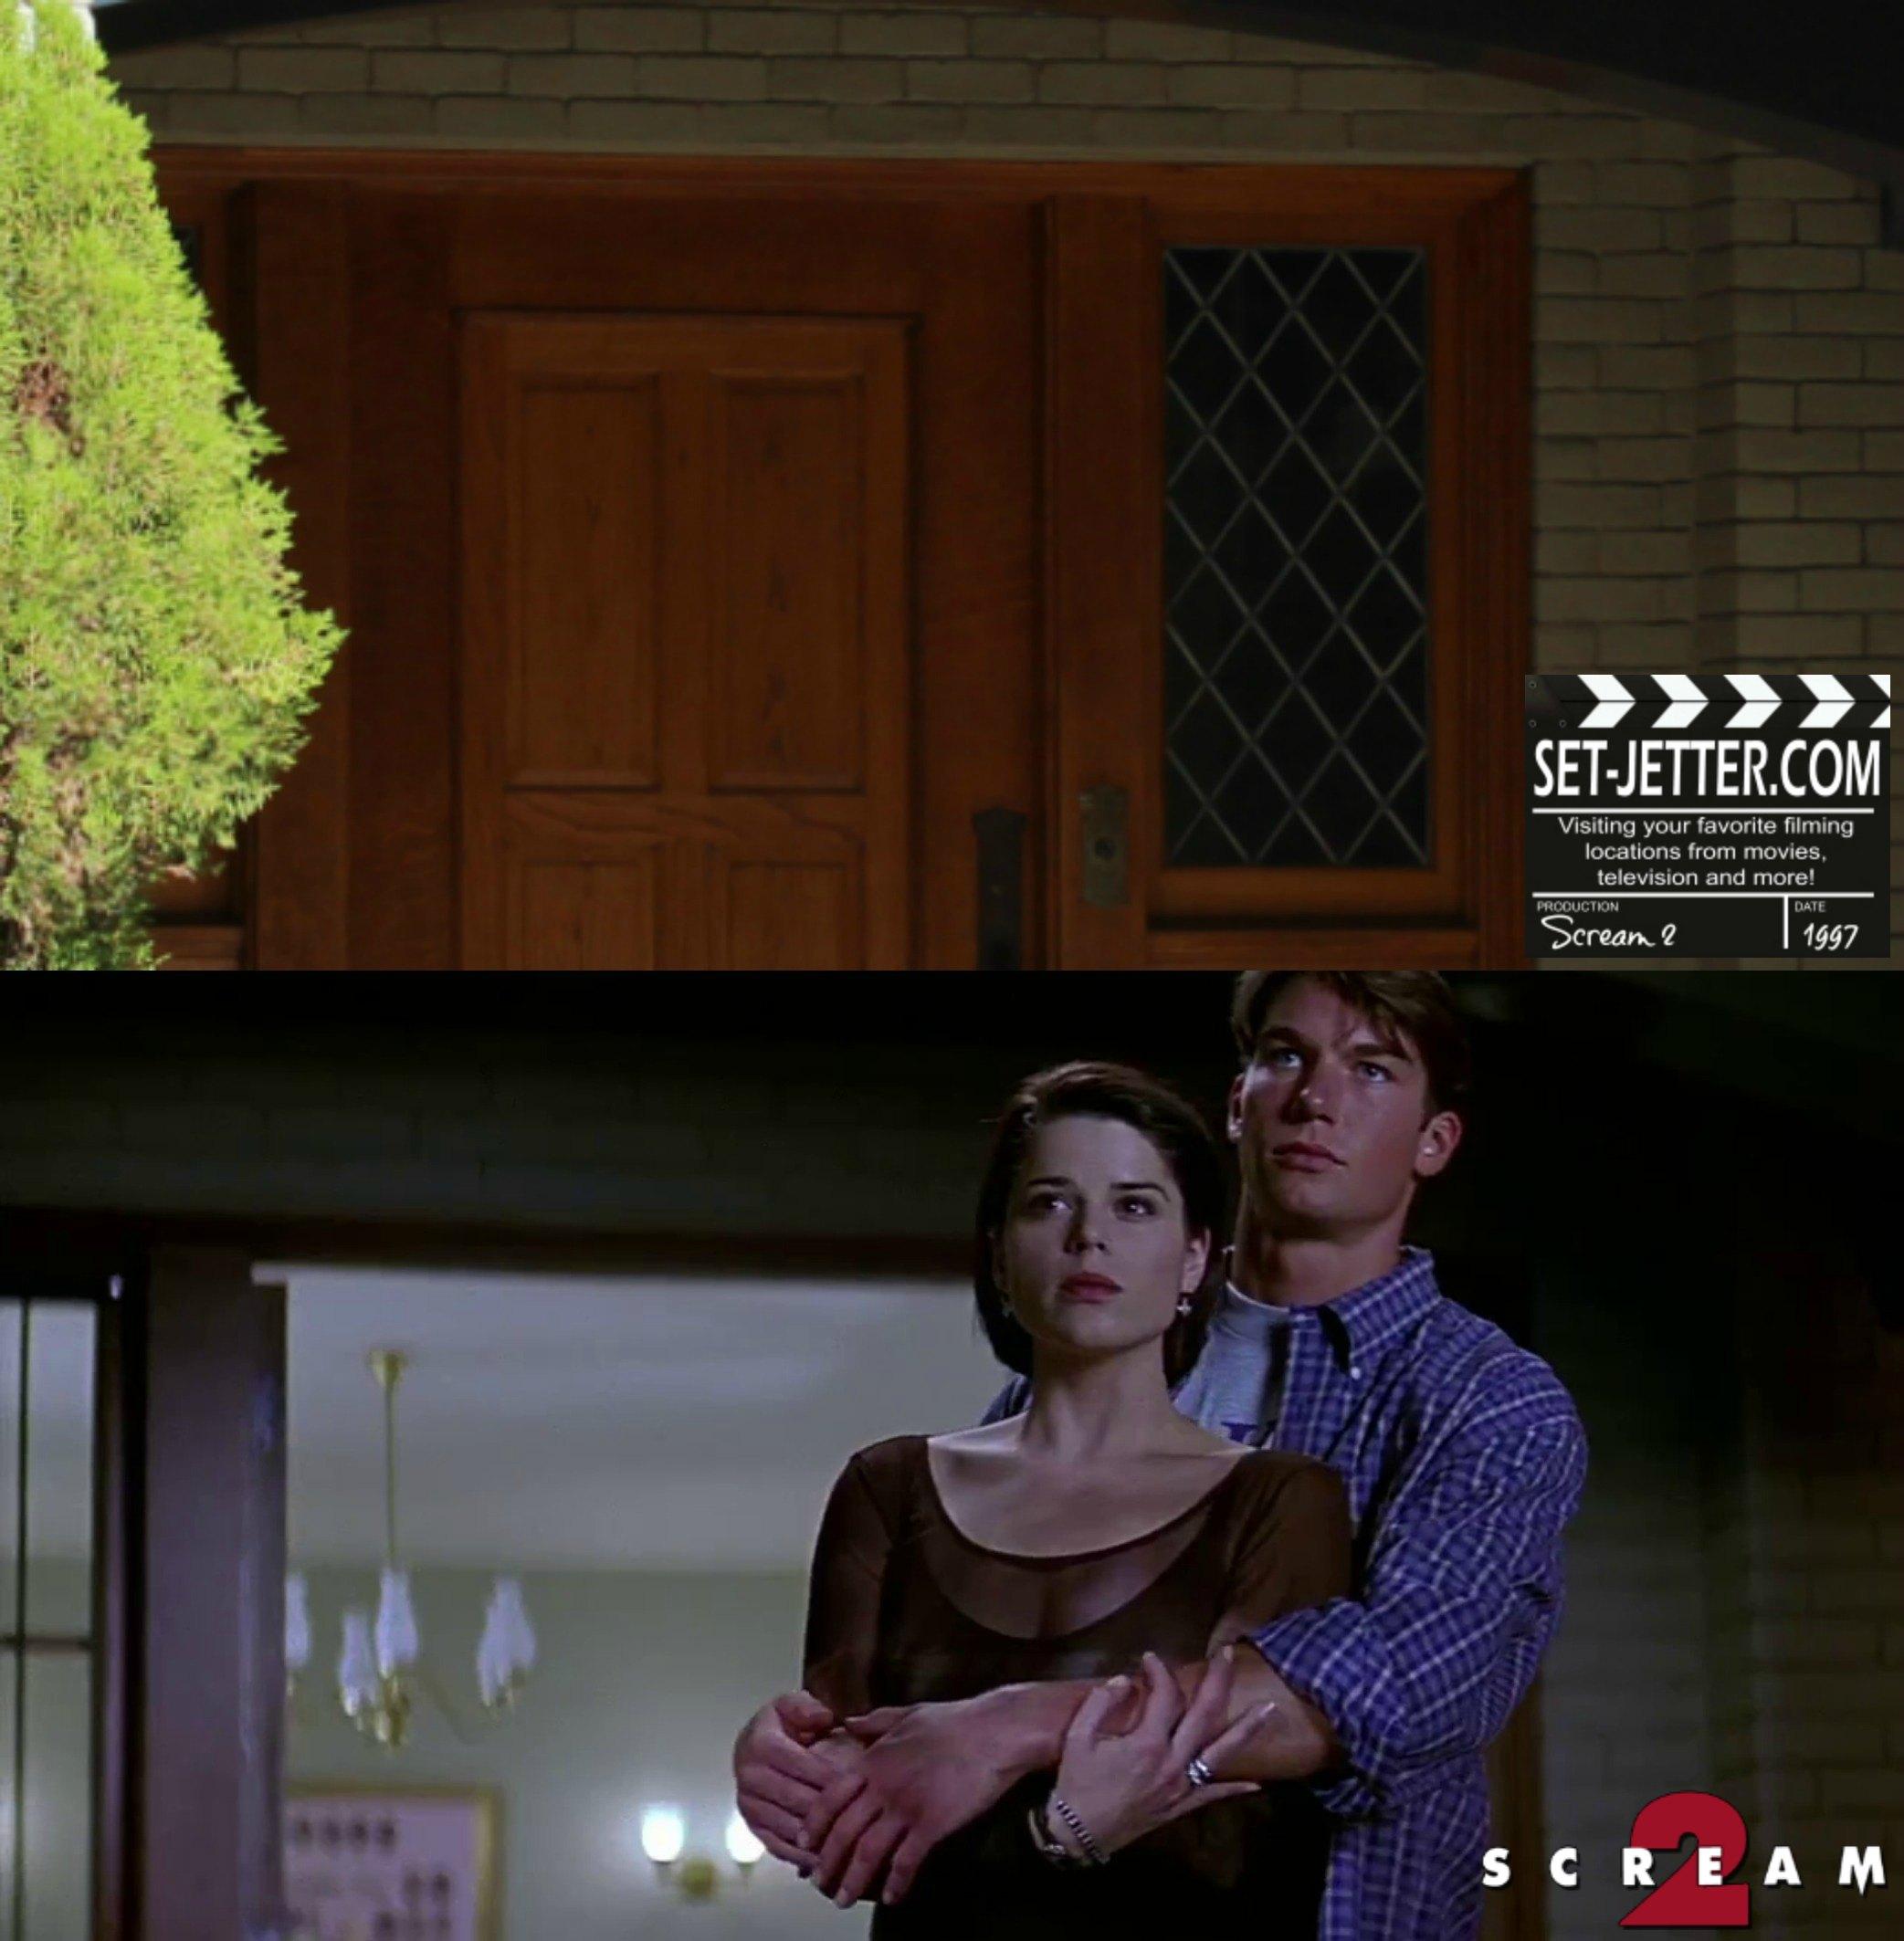 Scream 2 comparison 95.jpg